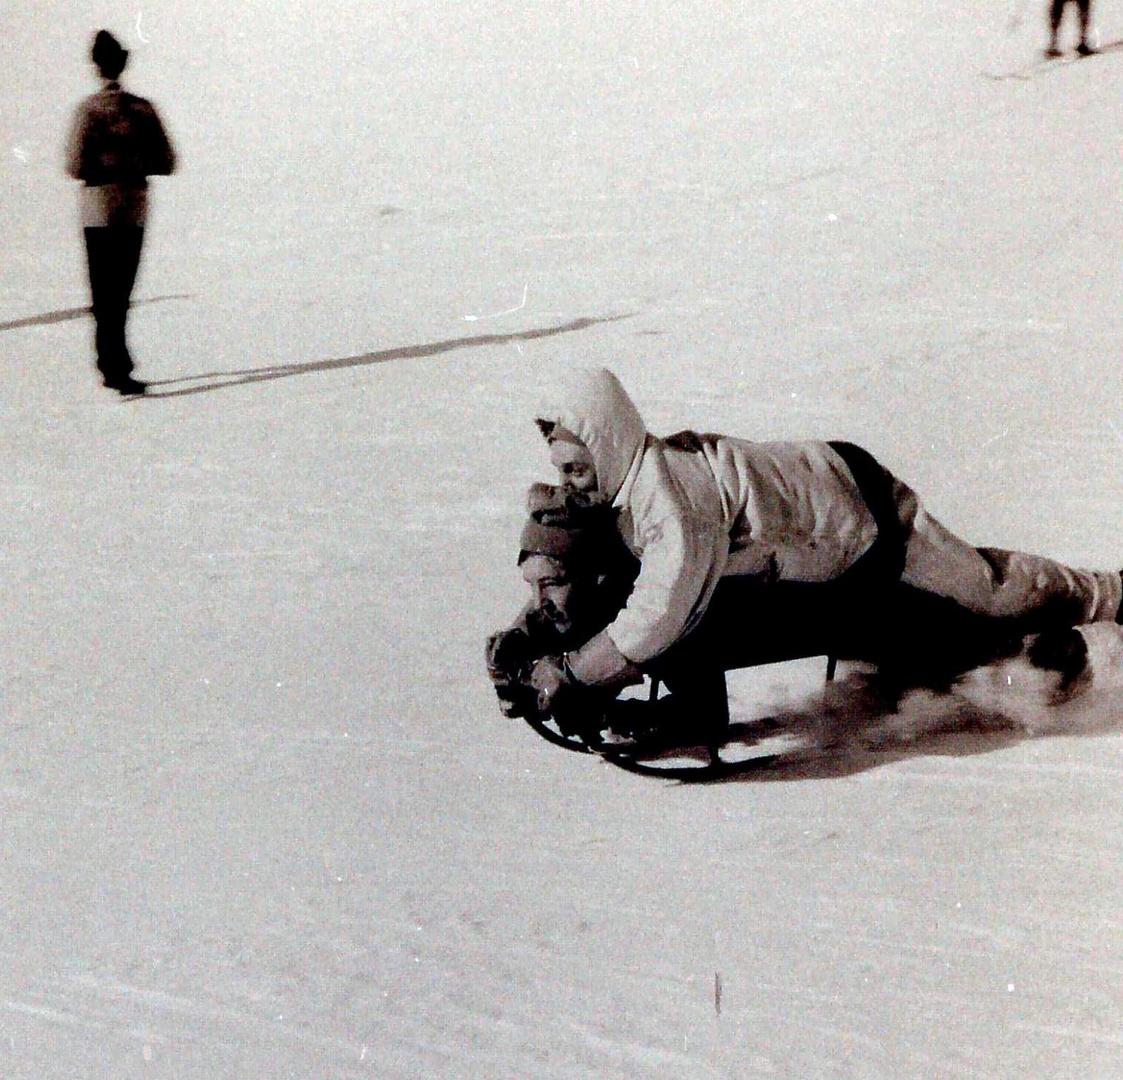 Wintersport um 1950 (8)